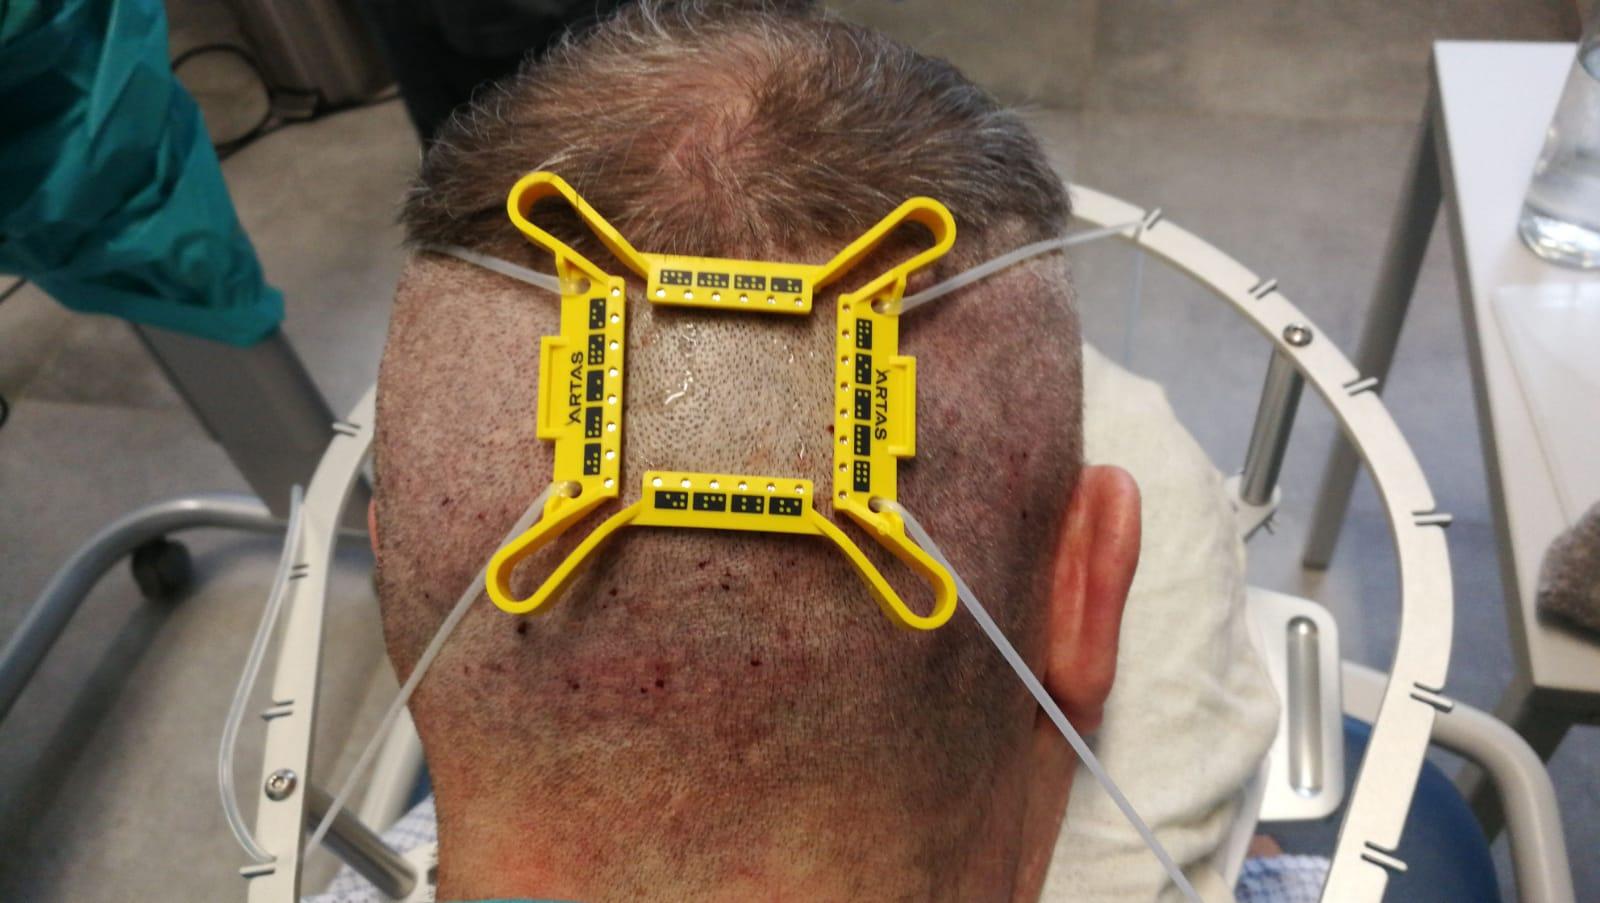 Haartransplantation mit dem ARTAS-Roboter